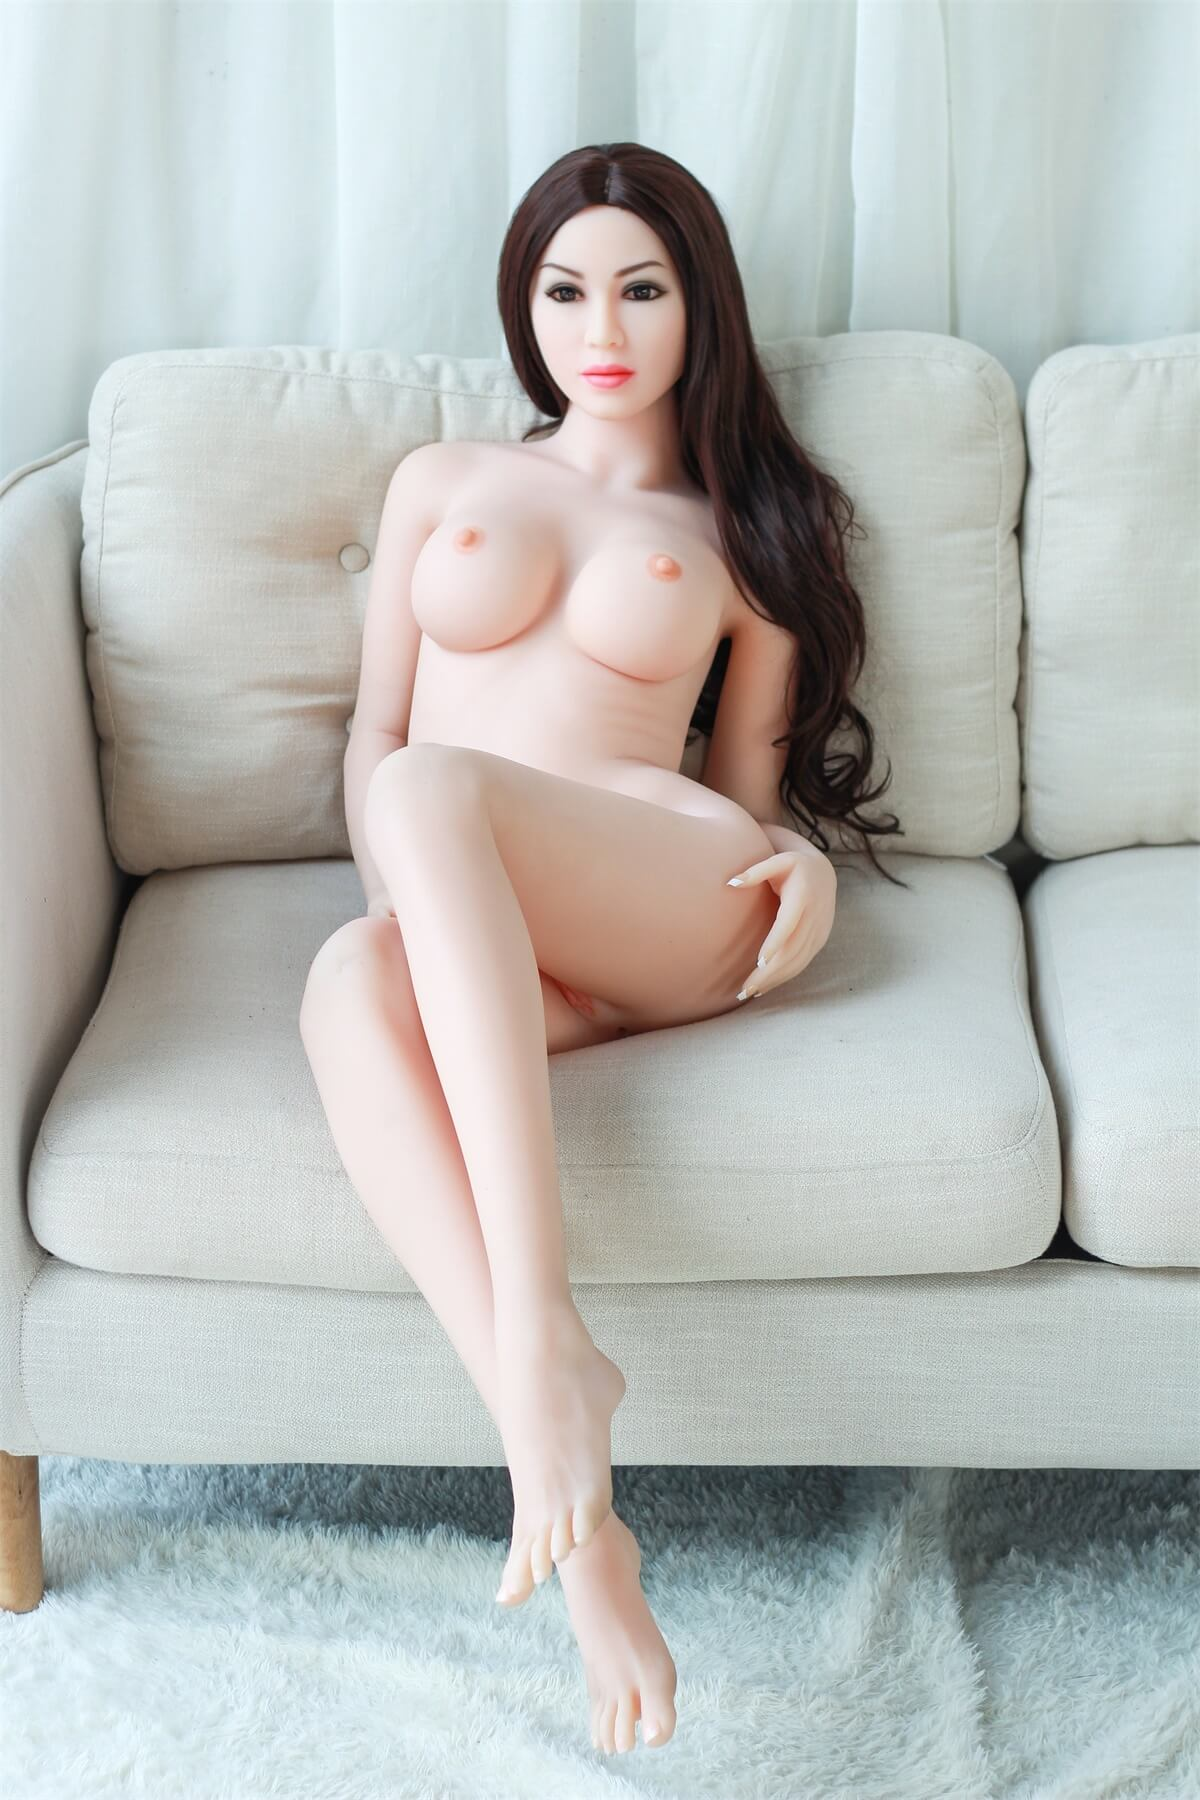 US Skinny Sex Doll